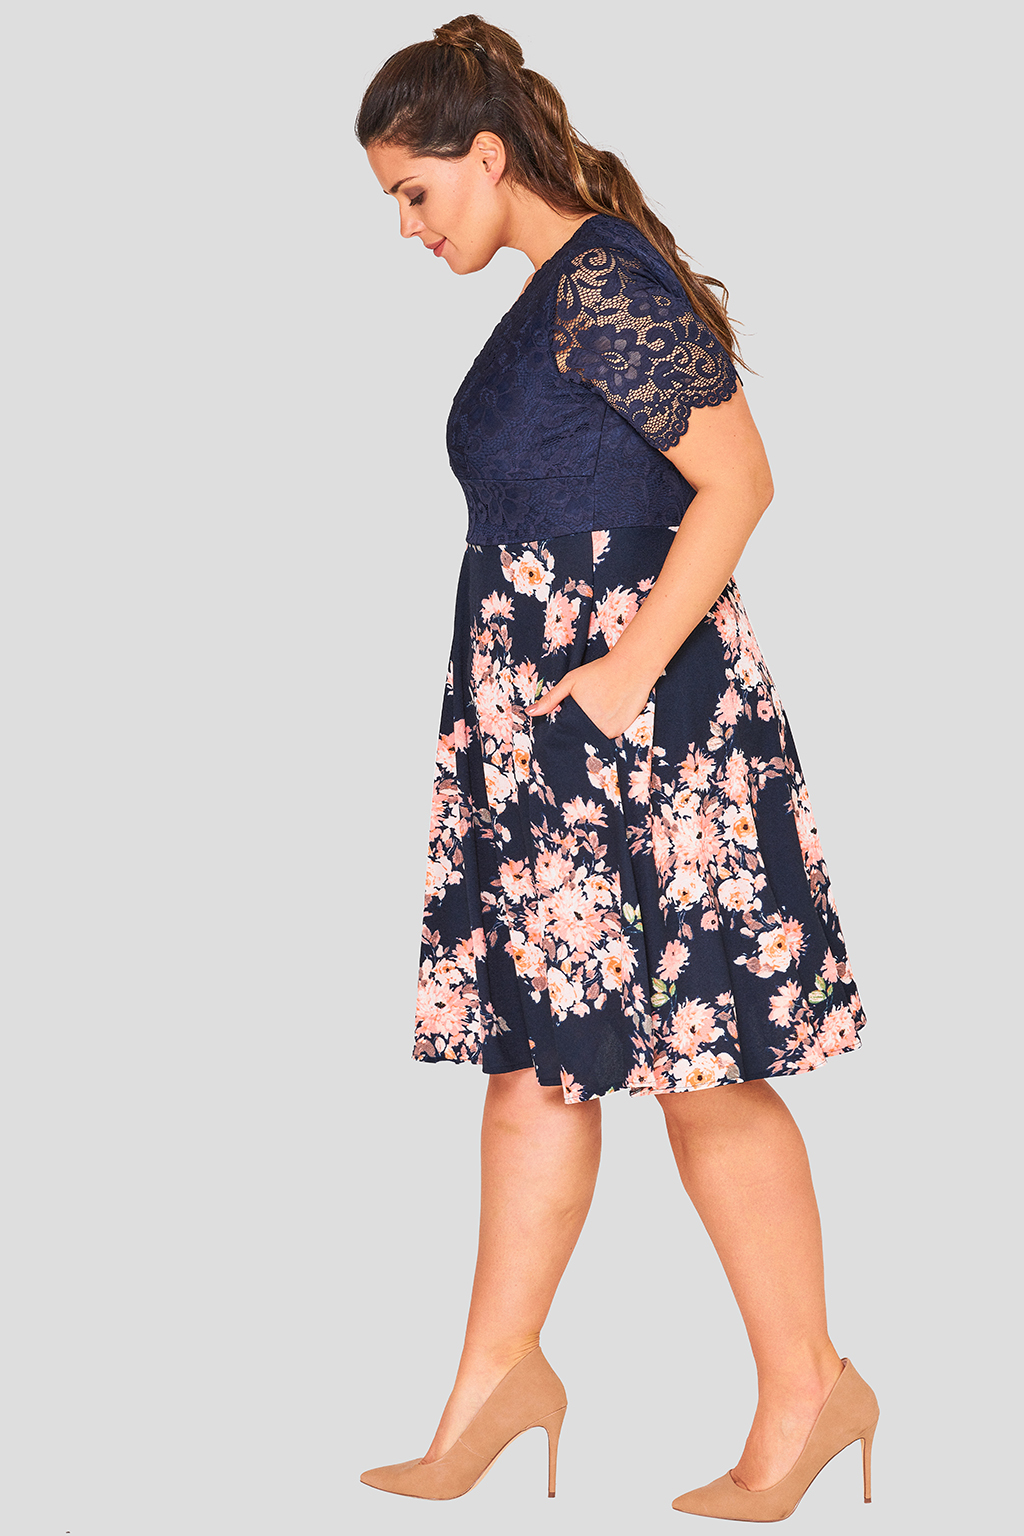 Wholesale Lace Plus size Skater Dress - Fashion Book